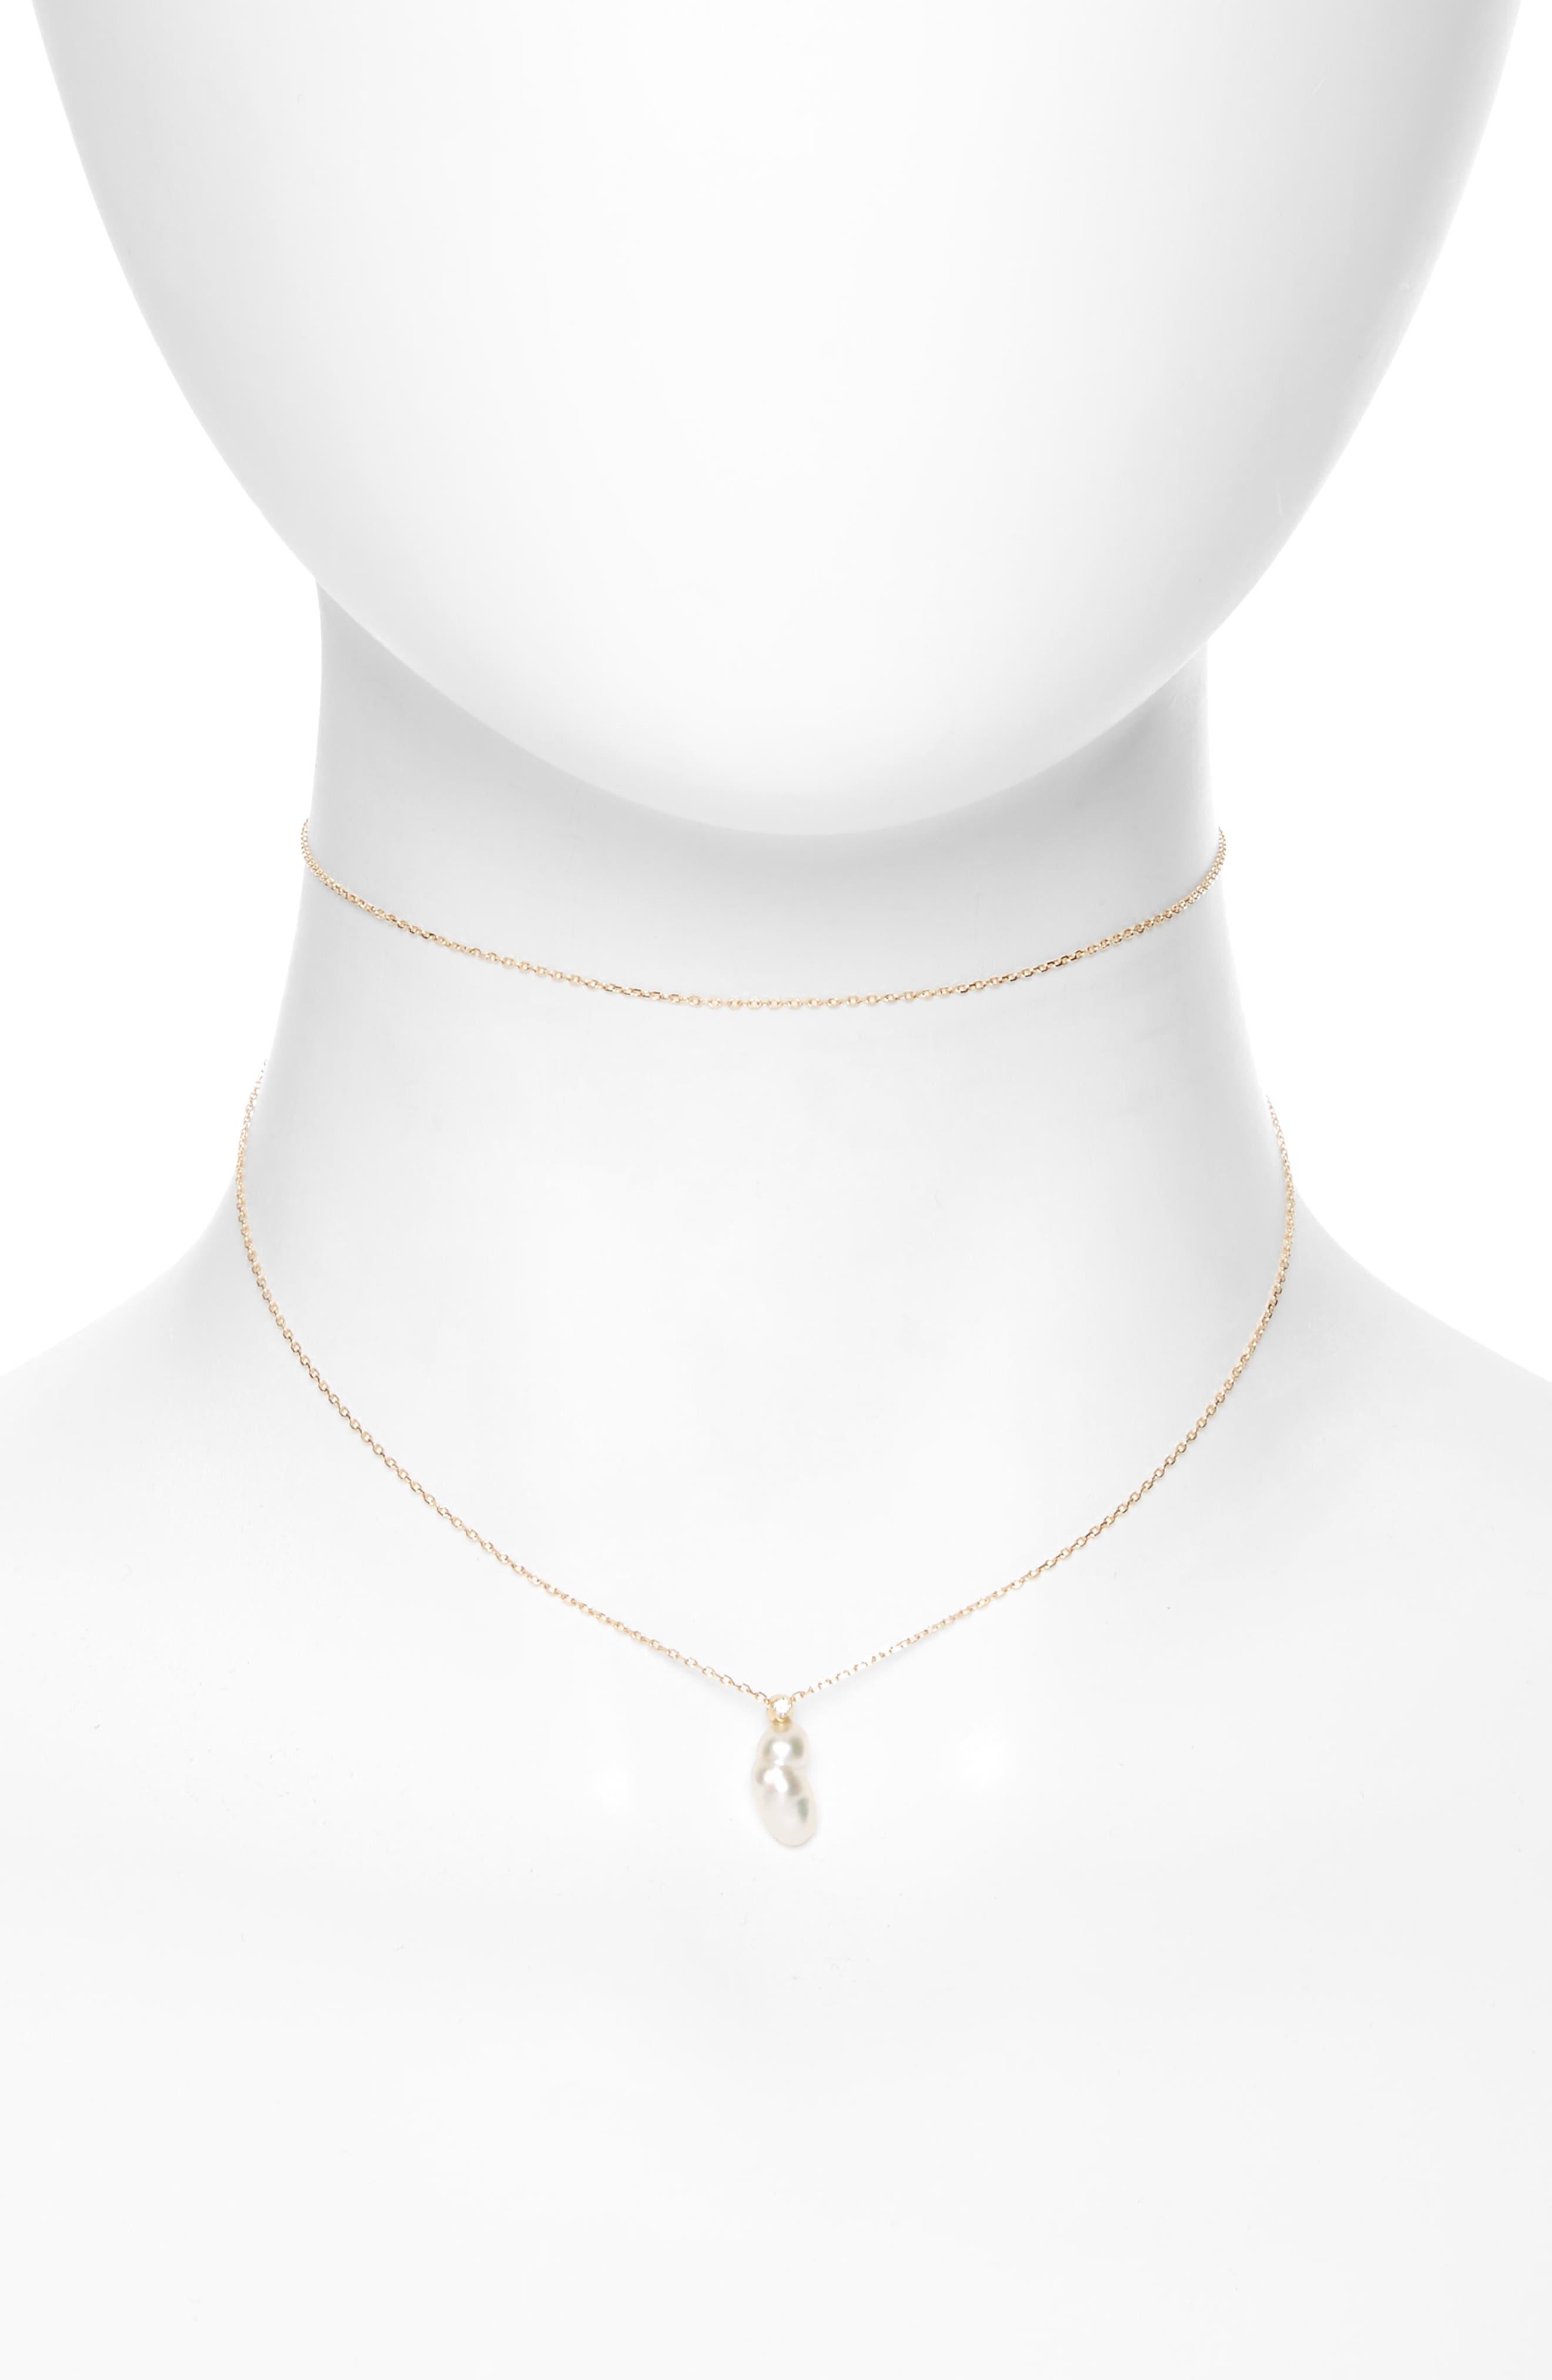 Sea of Beauty Diamond & Keshi Pearl Multistrand Choker,                         Main,                         color, Yellow Gold/ White Pearl